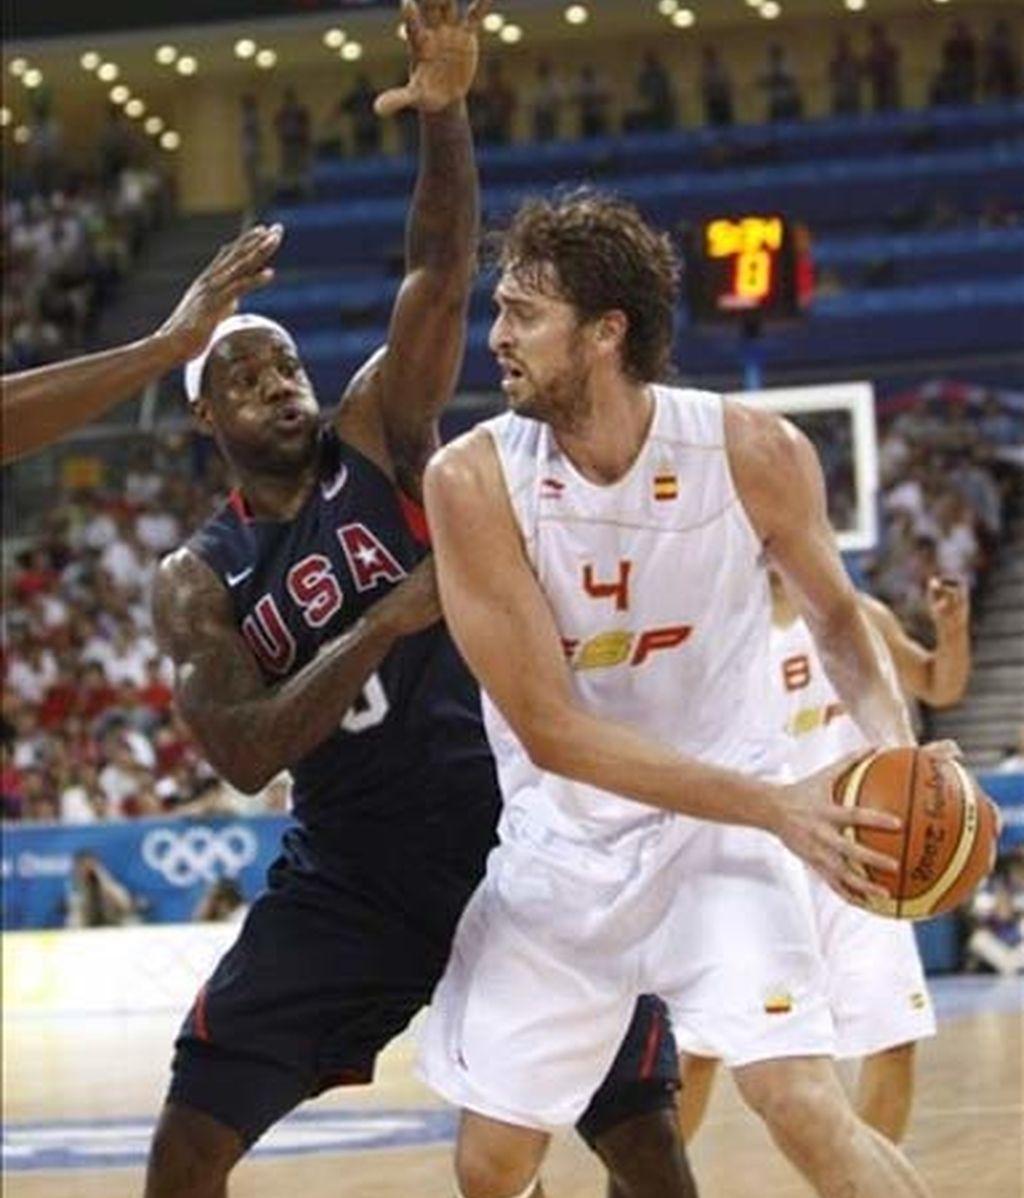 España no pudo con la selección NBA